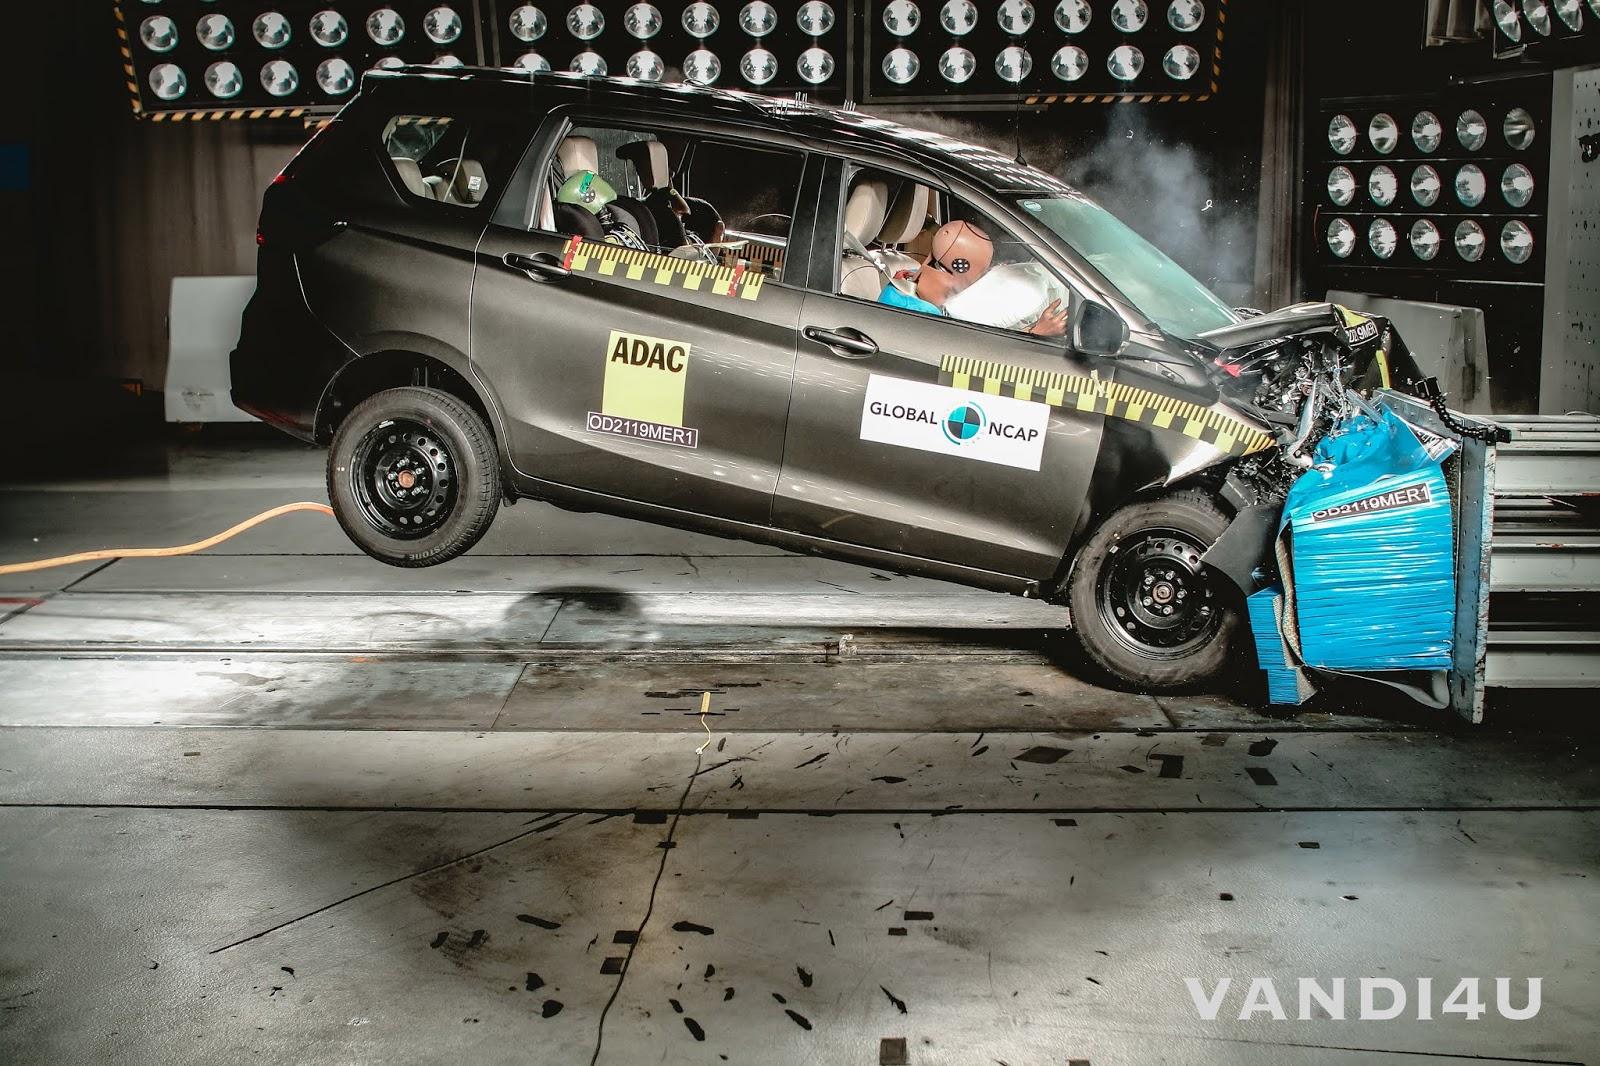 Three star Ertiga and one star Datsun Redi Go in latest Global NCAP crash test results for India | VANDI4U